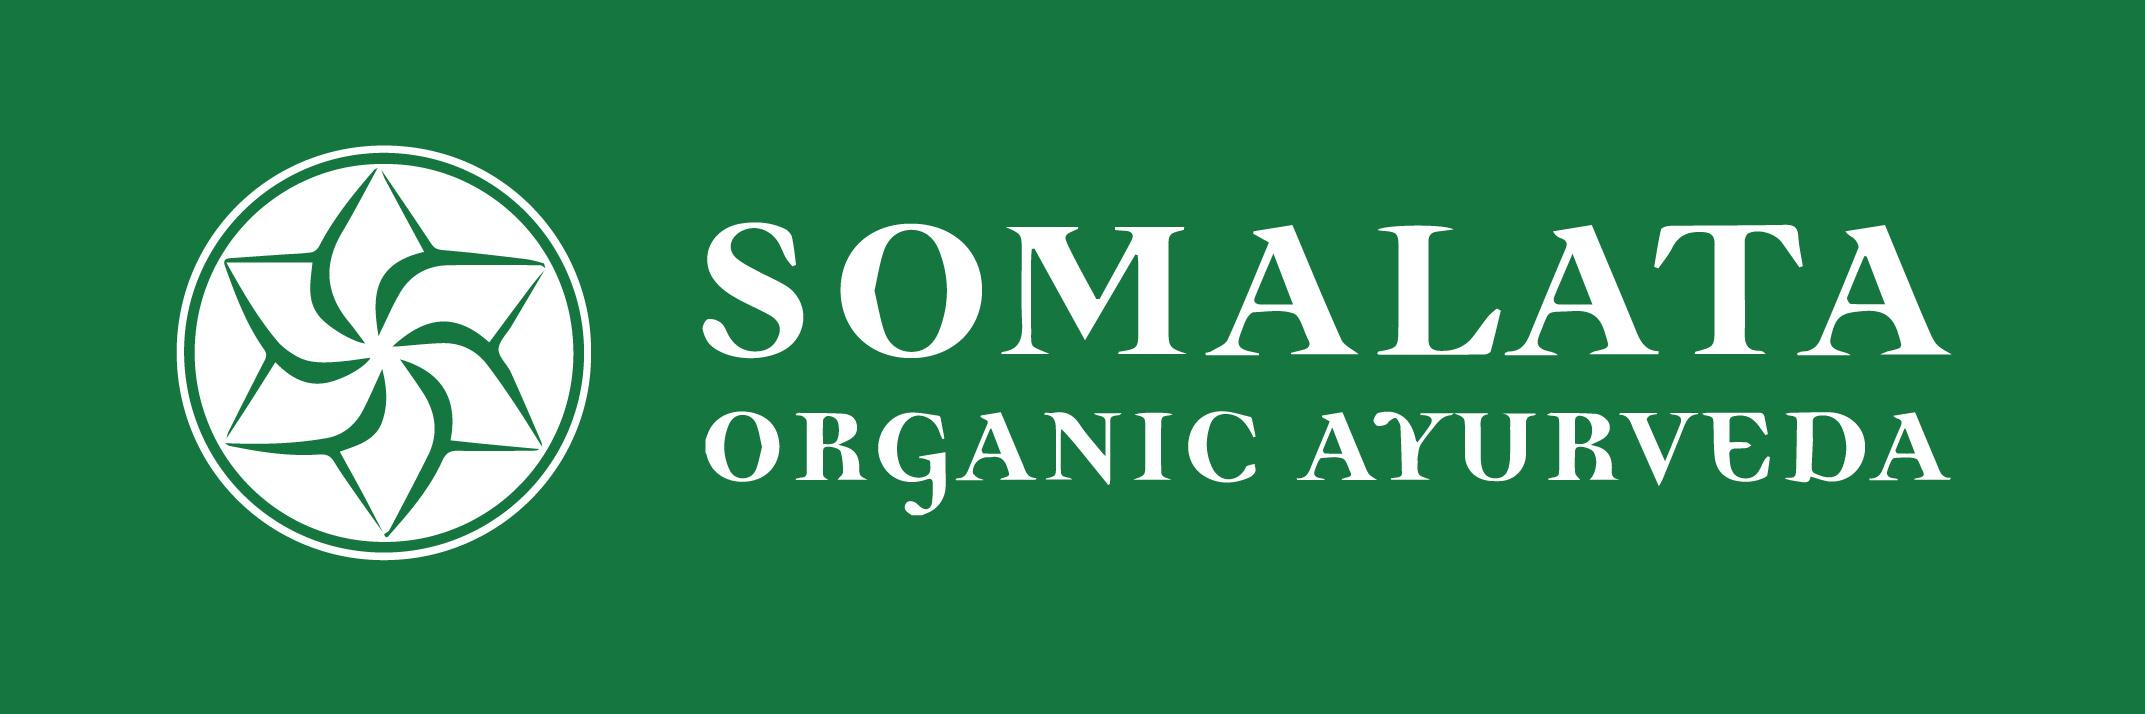 https://www.ilads.org/wp-content/uploads/2019/01/Somalata-Organic-Ayurveda-LOGO.jpg